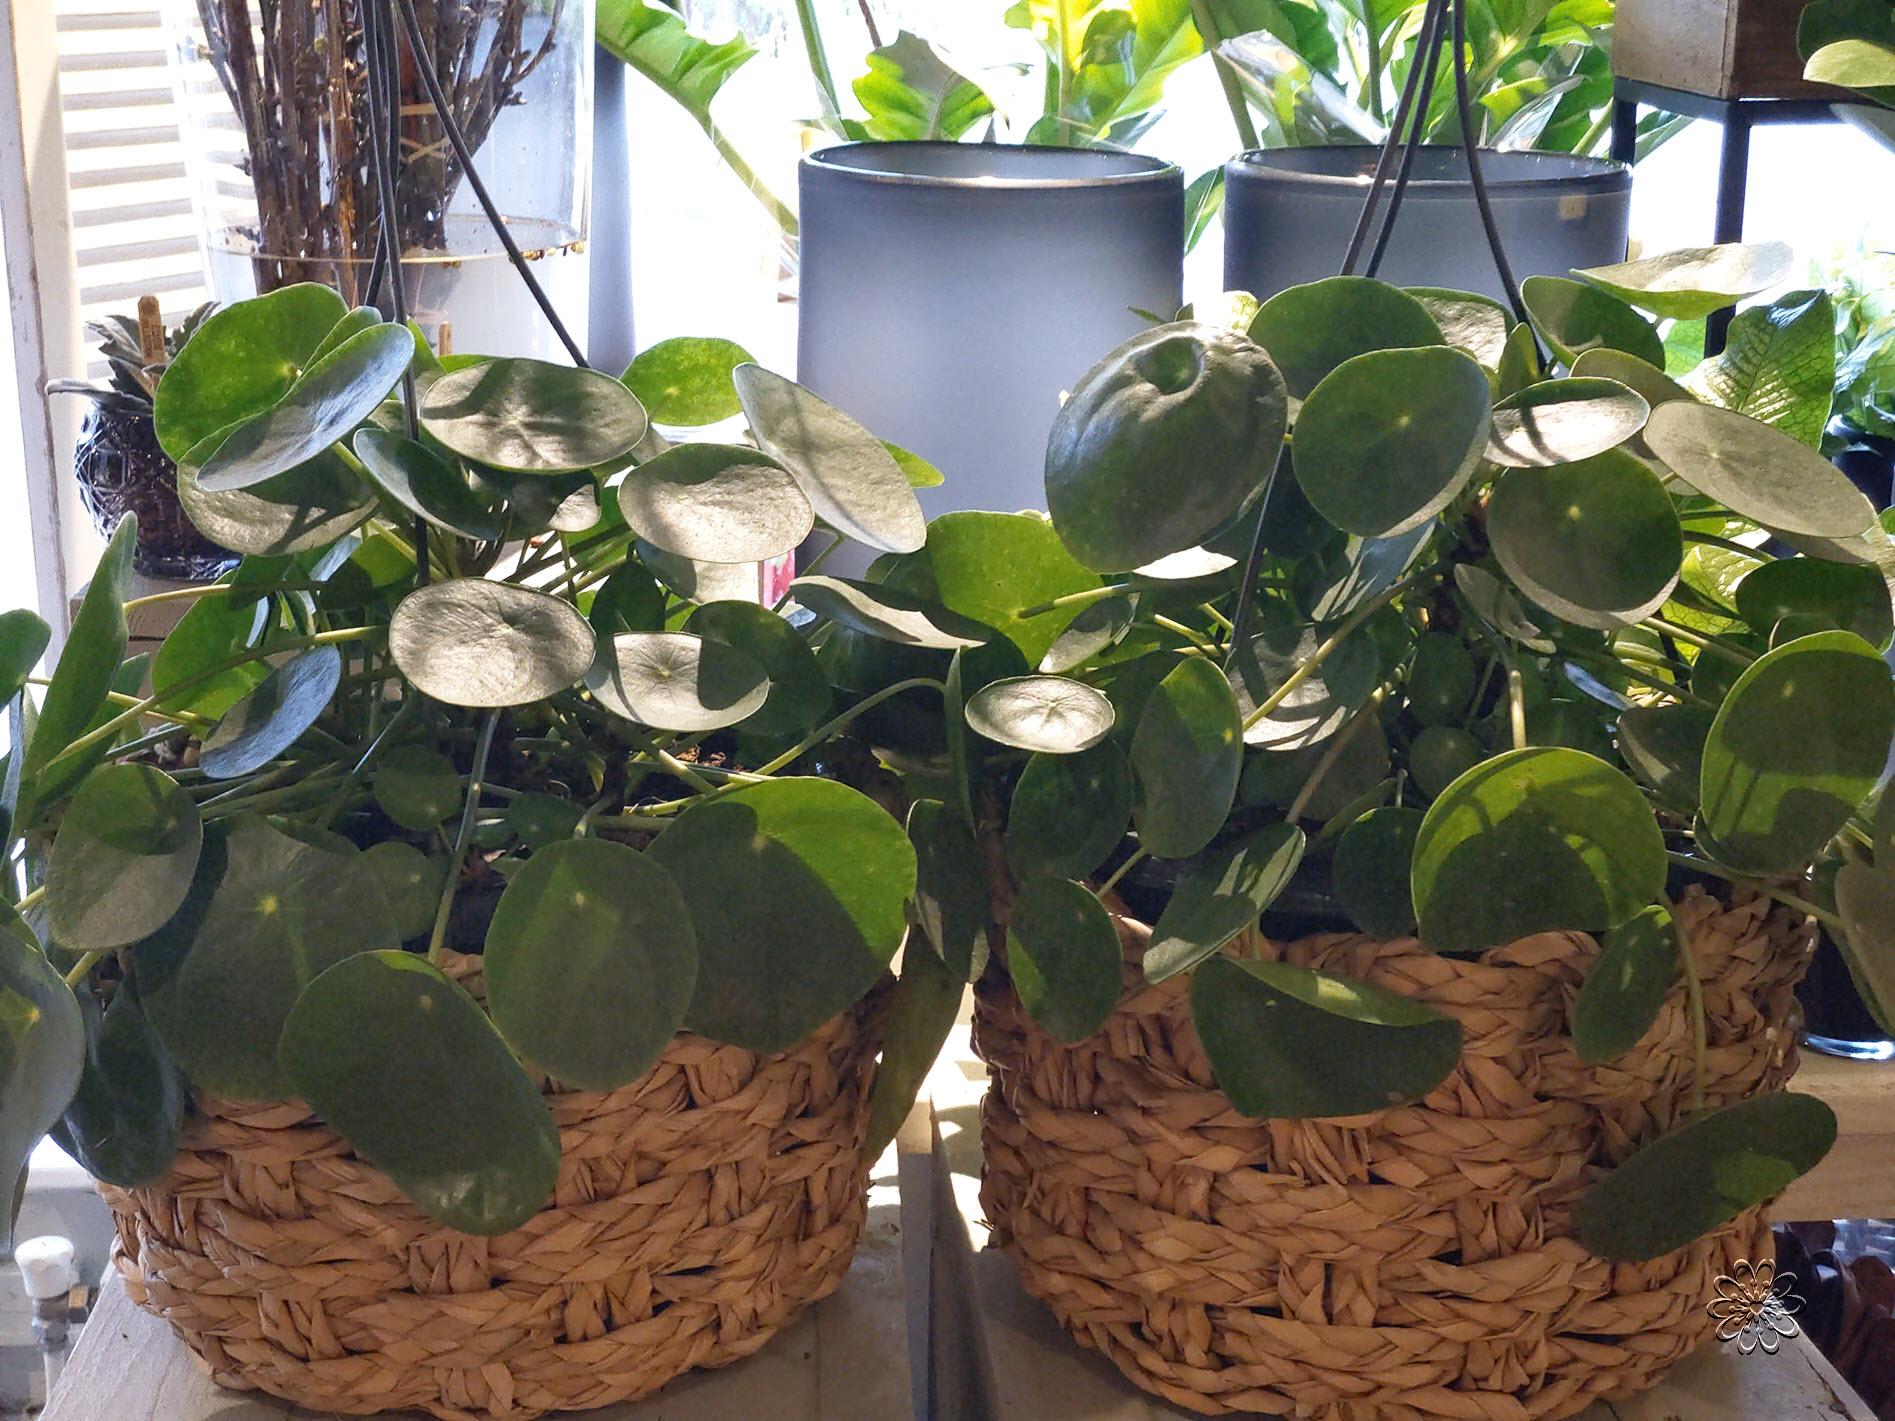 Bloemsierkunst-Groeneveld-kamerplanten-bollen-04